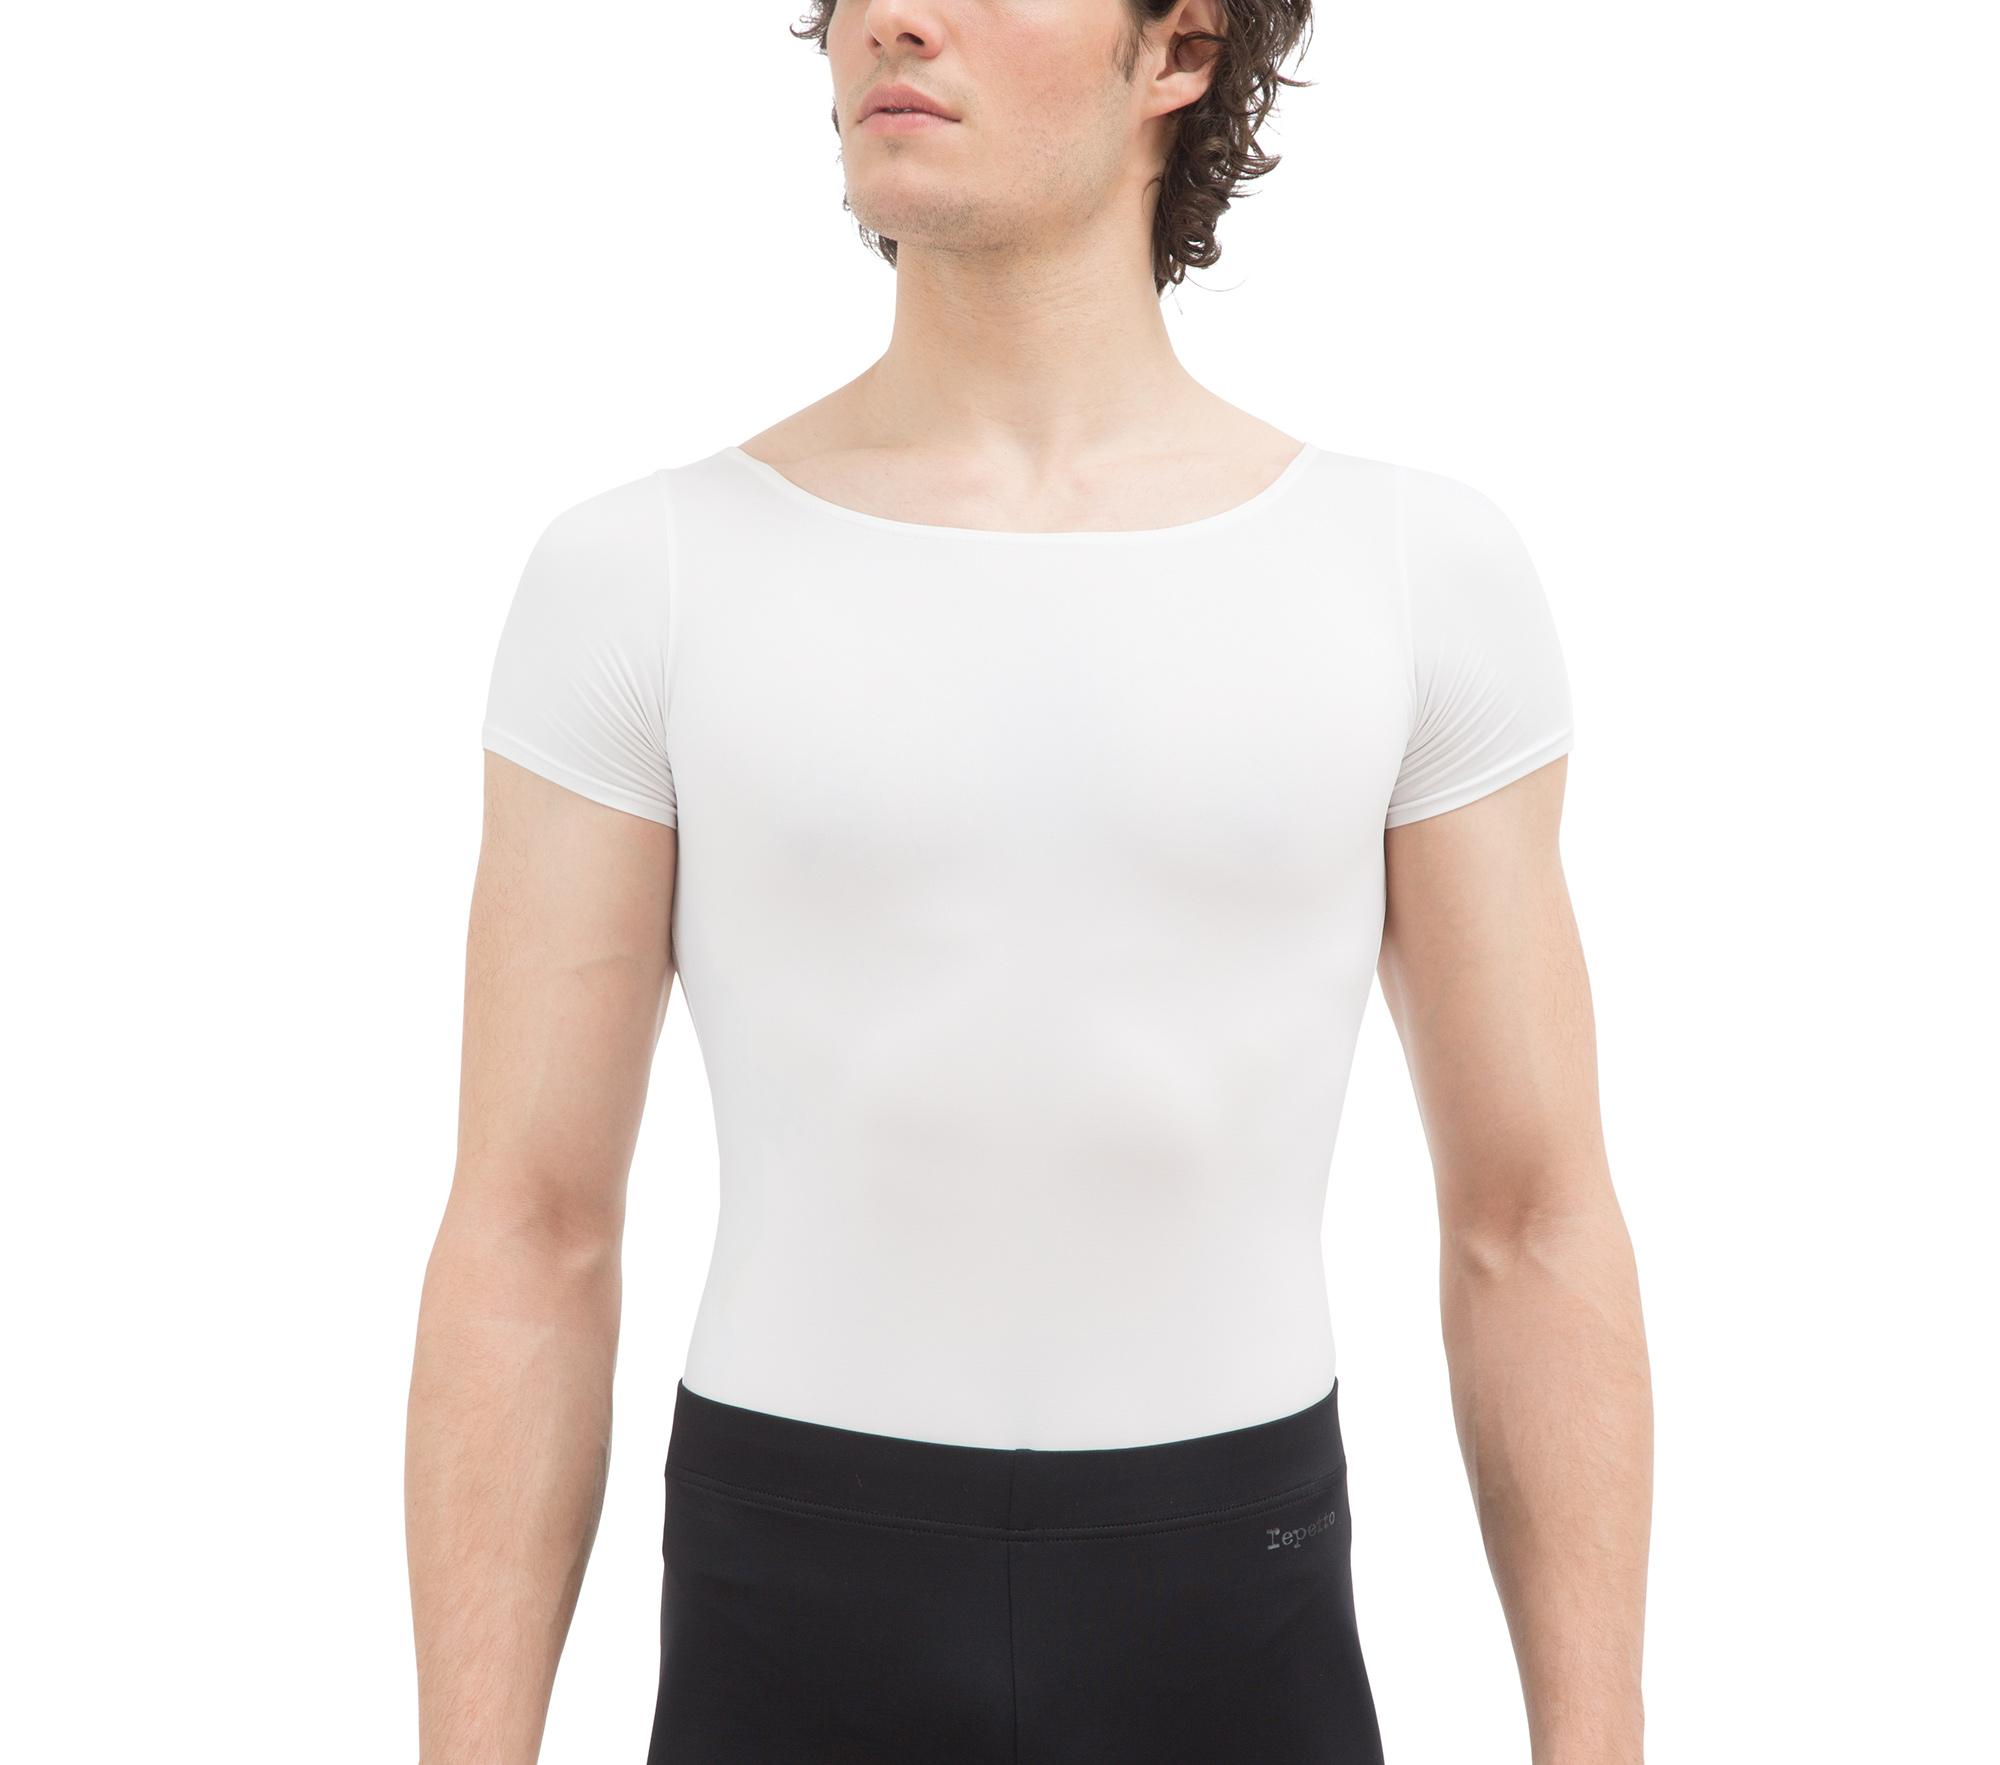 Short sleeved leotard - Men